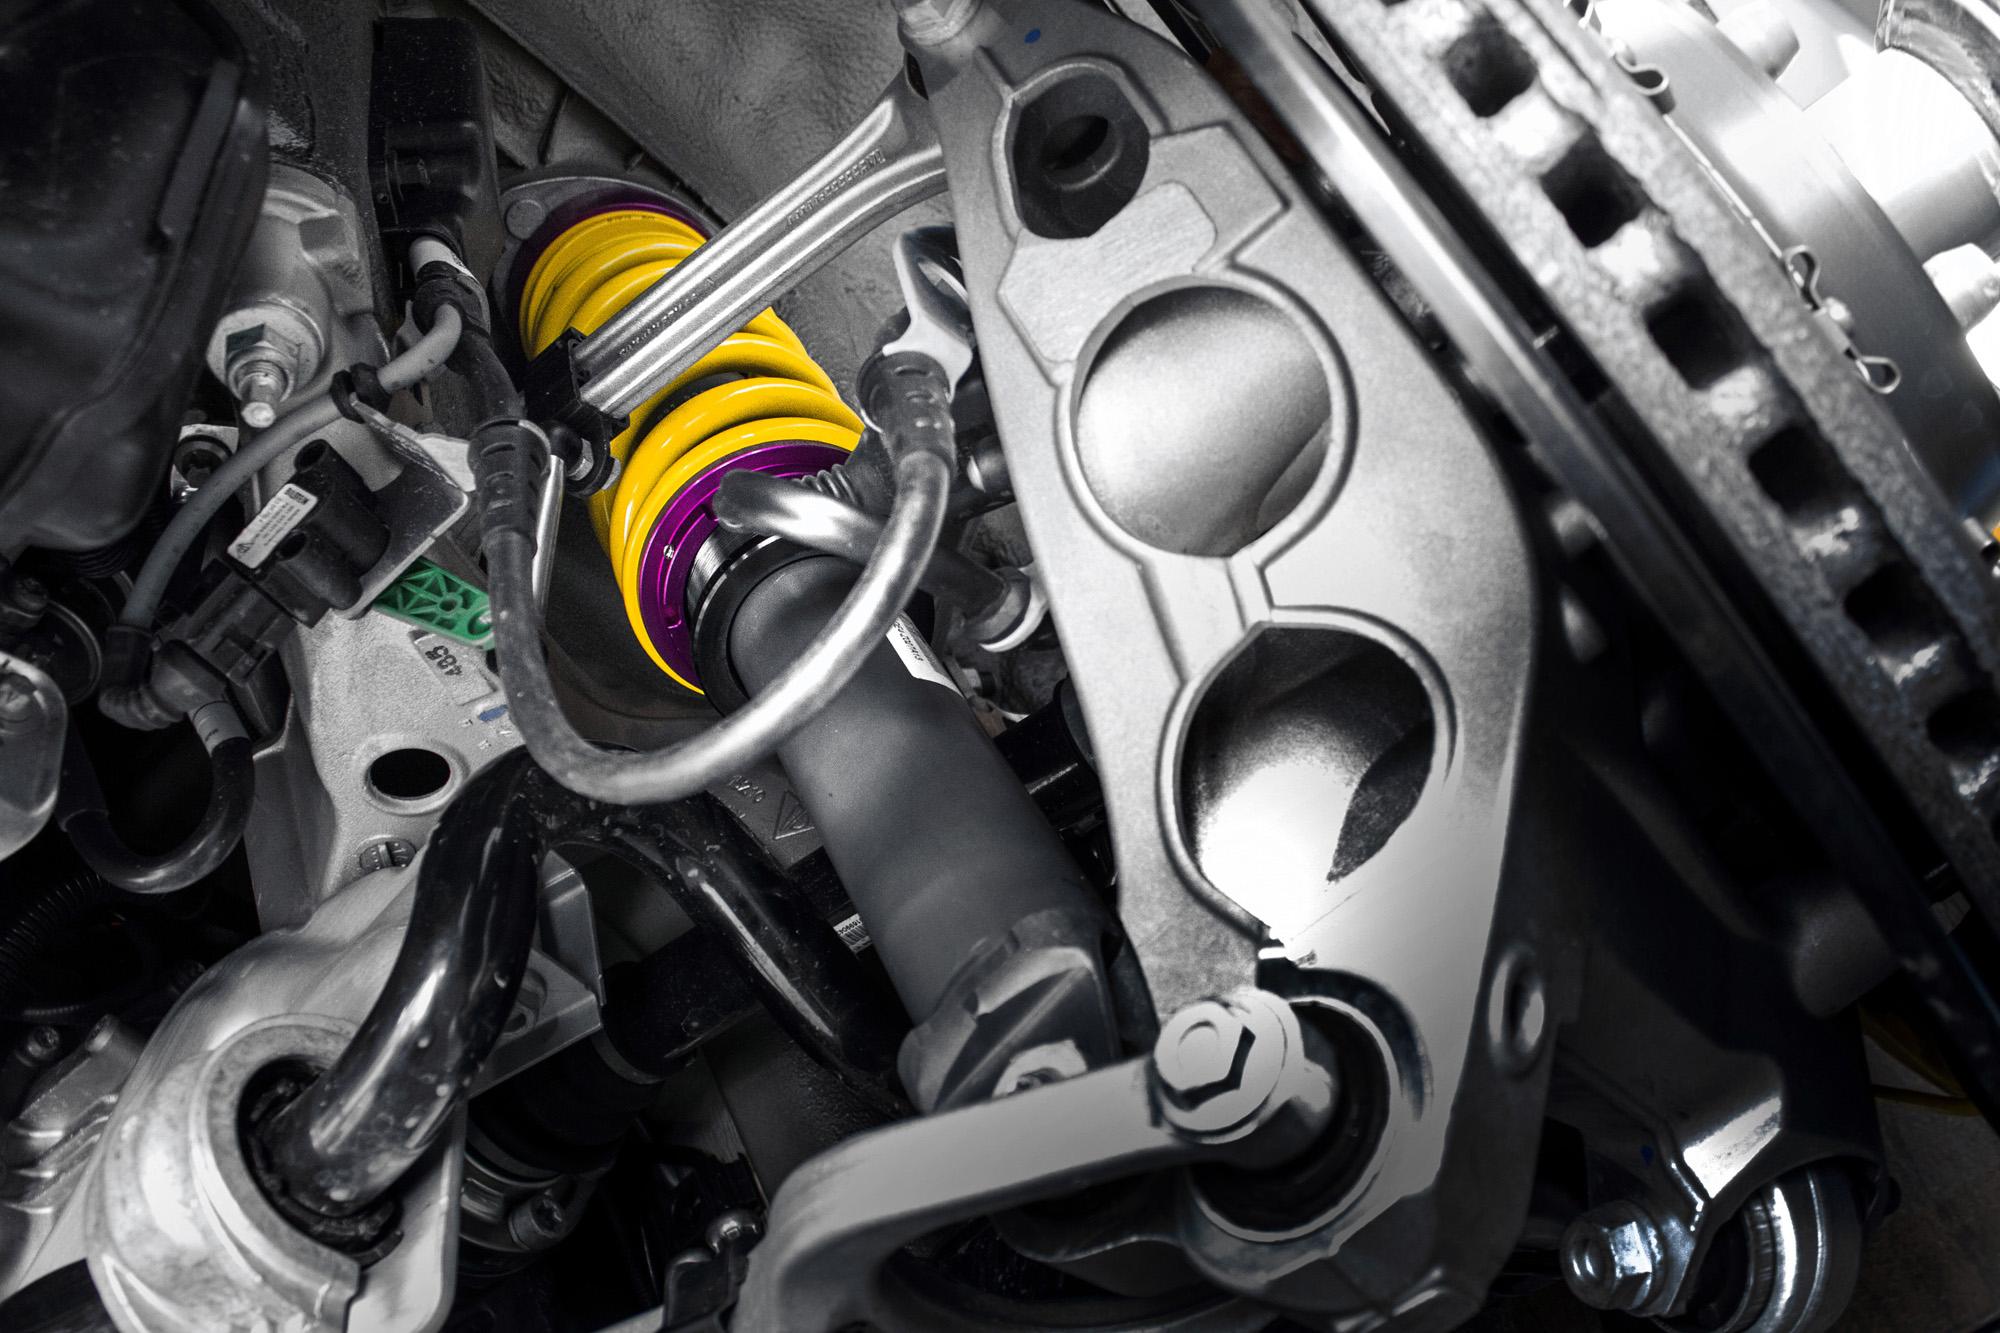 porsche-911-turbo-s-991-mcchip-dkr-04